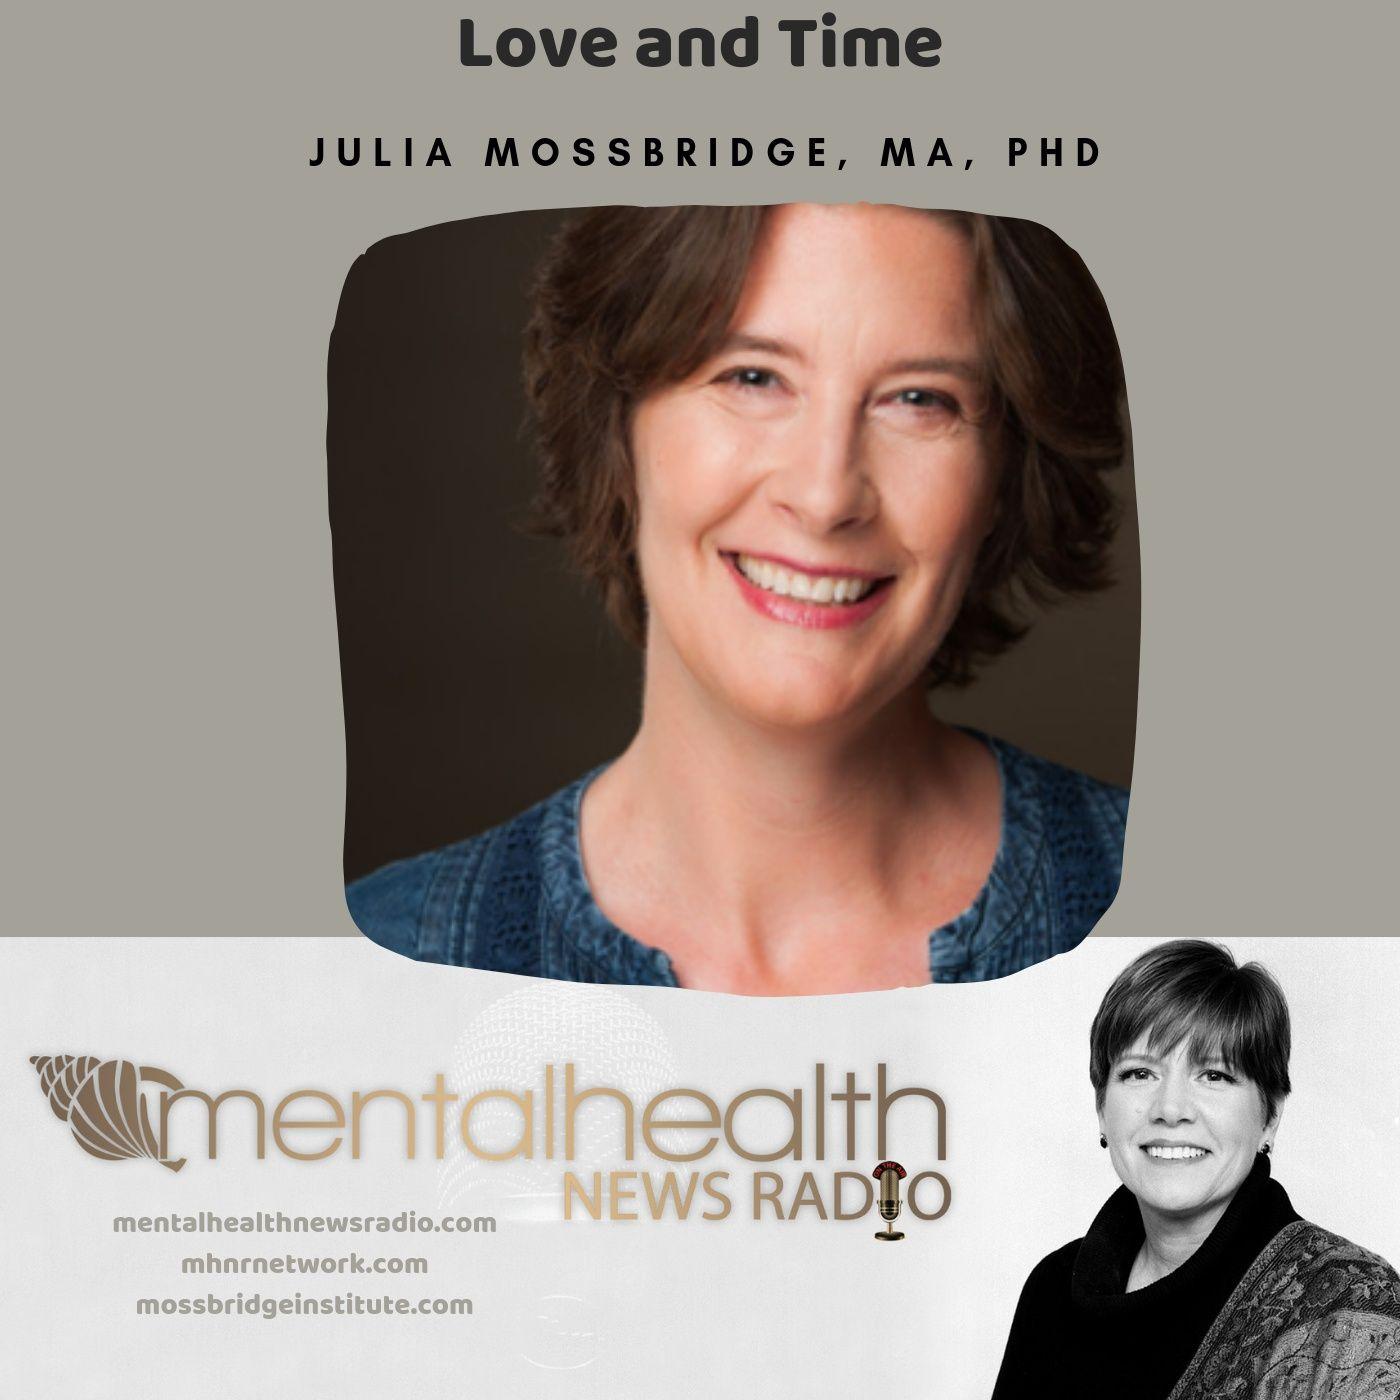 Mental Health News Radio - Love and Time with Dr. Julia Mossbridge